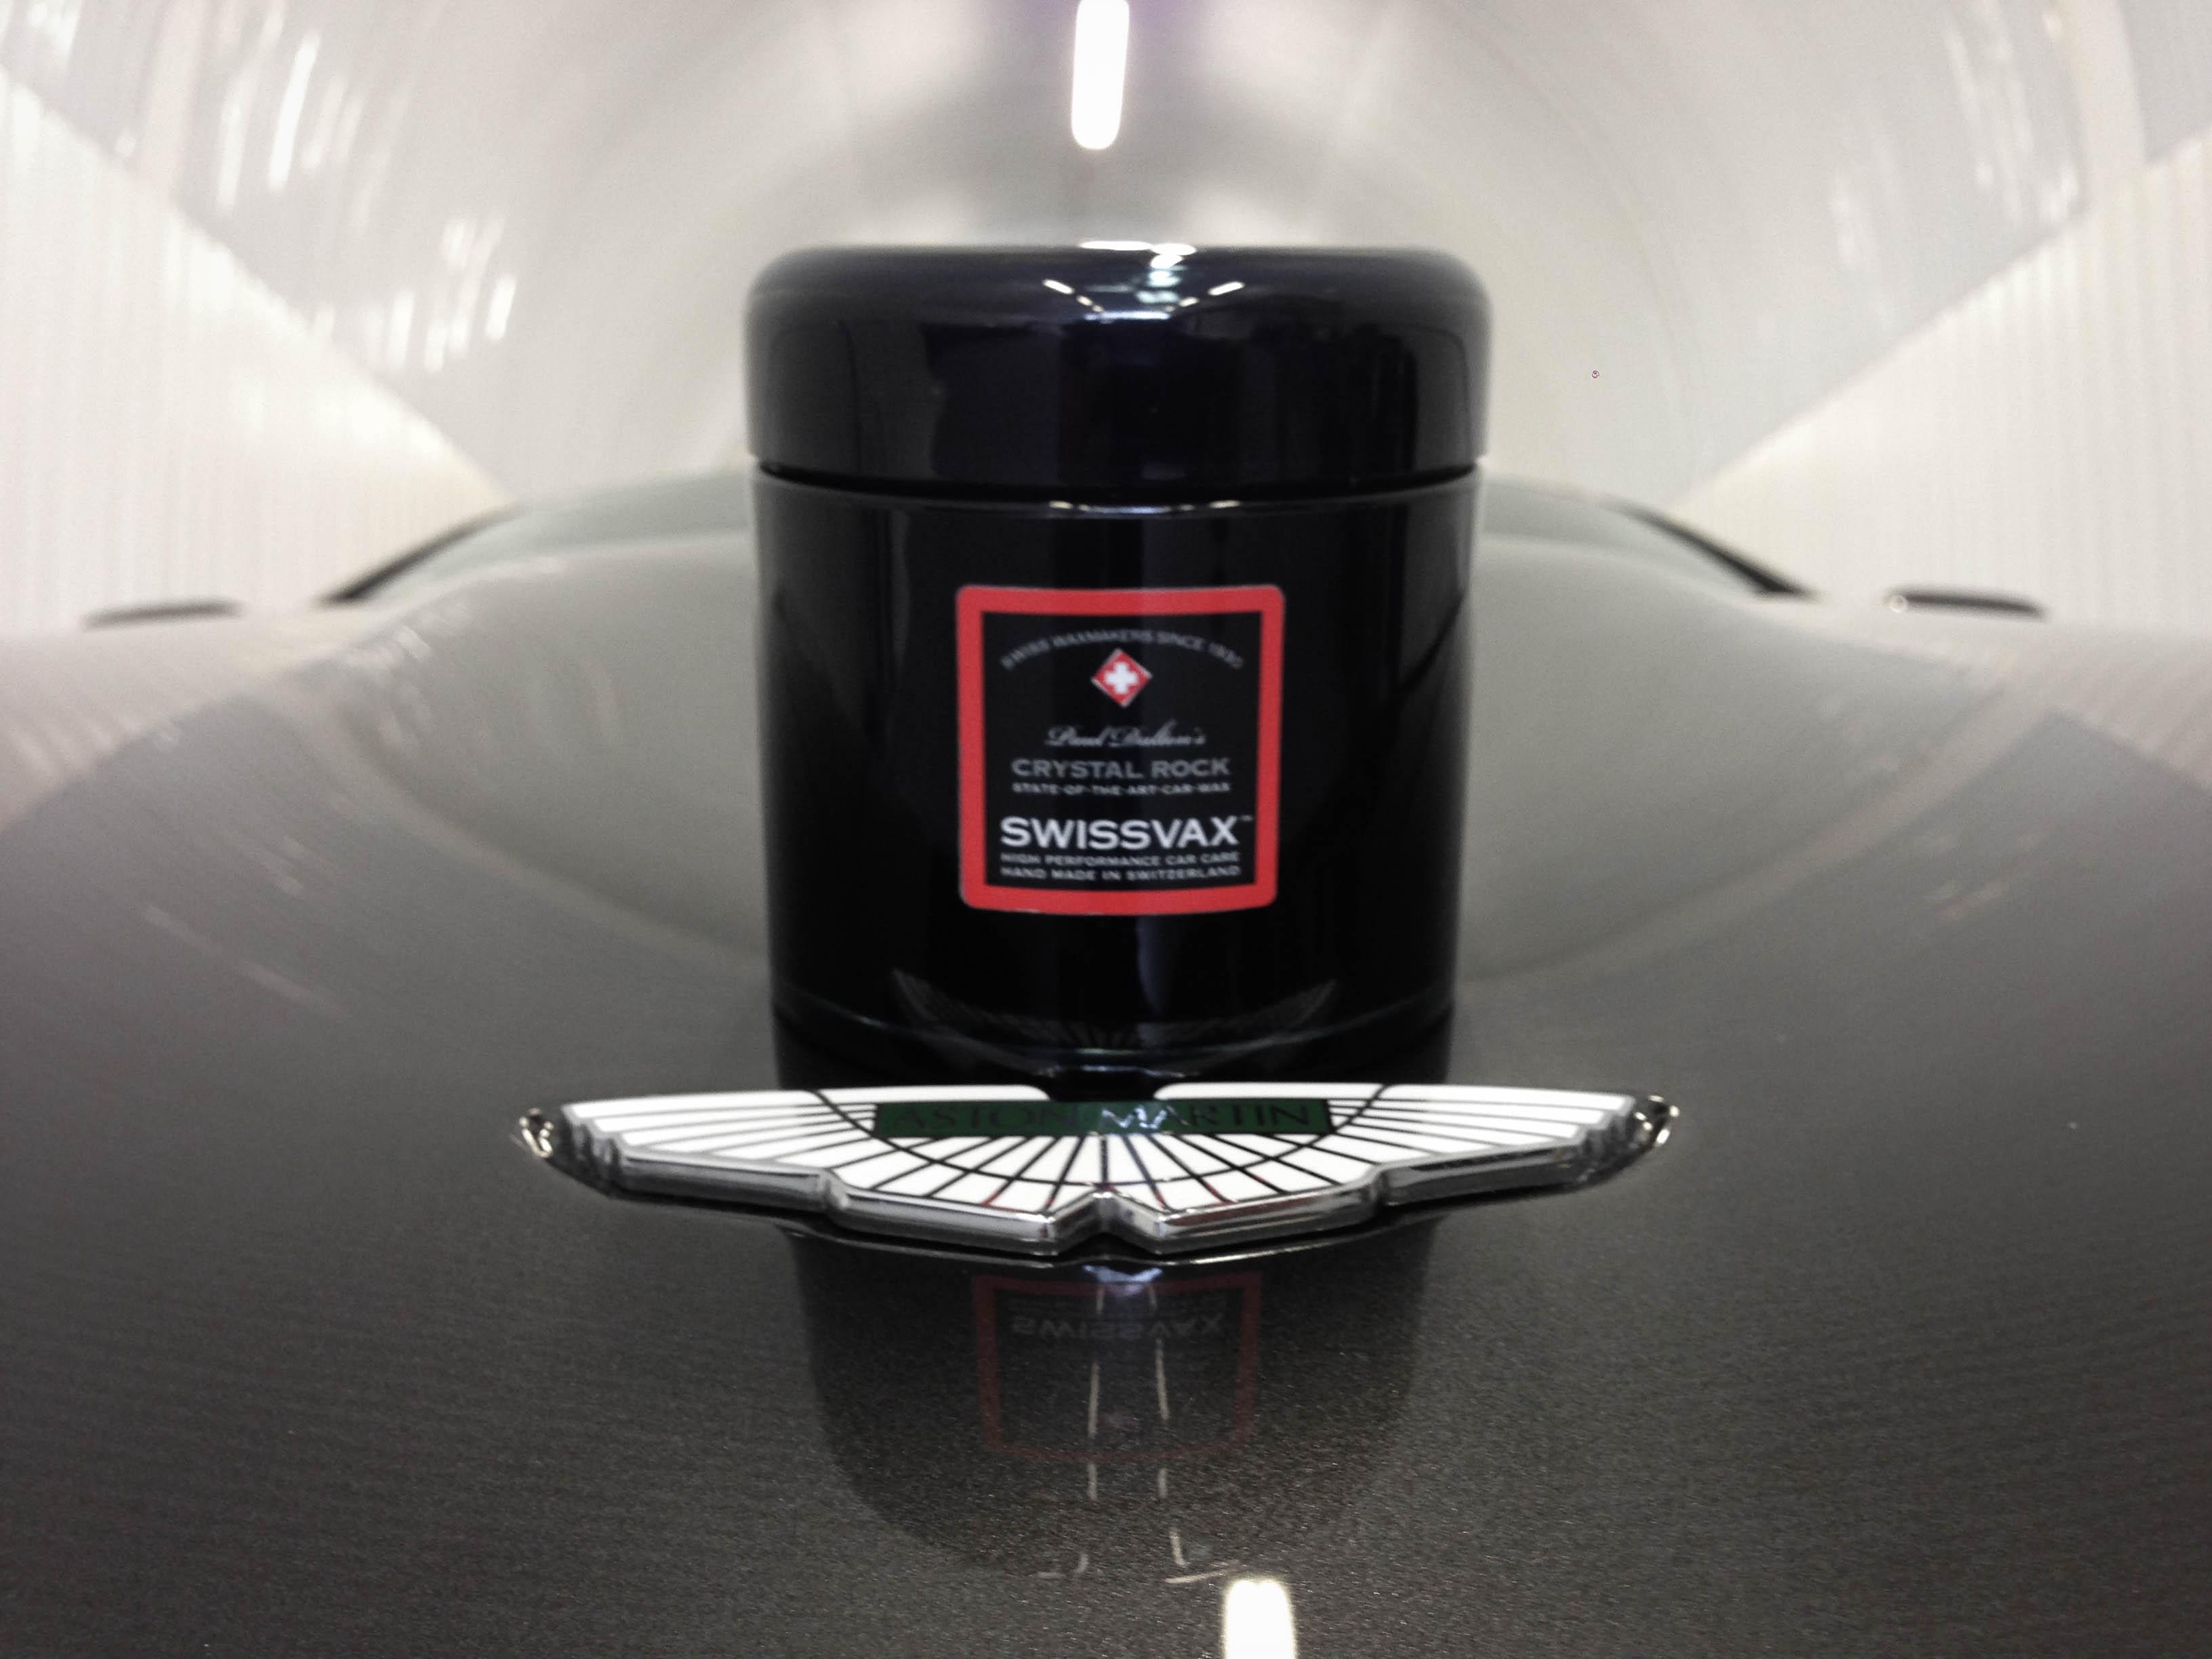 Aston-Martin-DB9 01